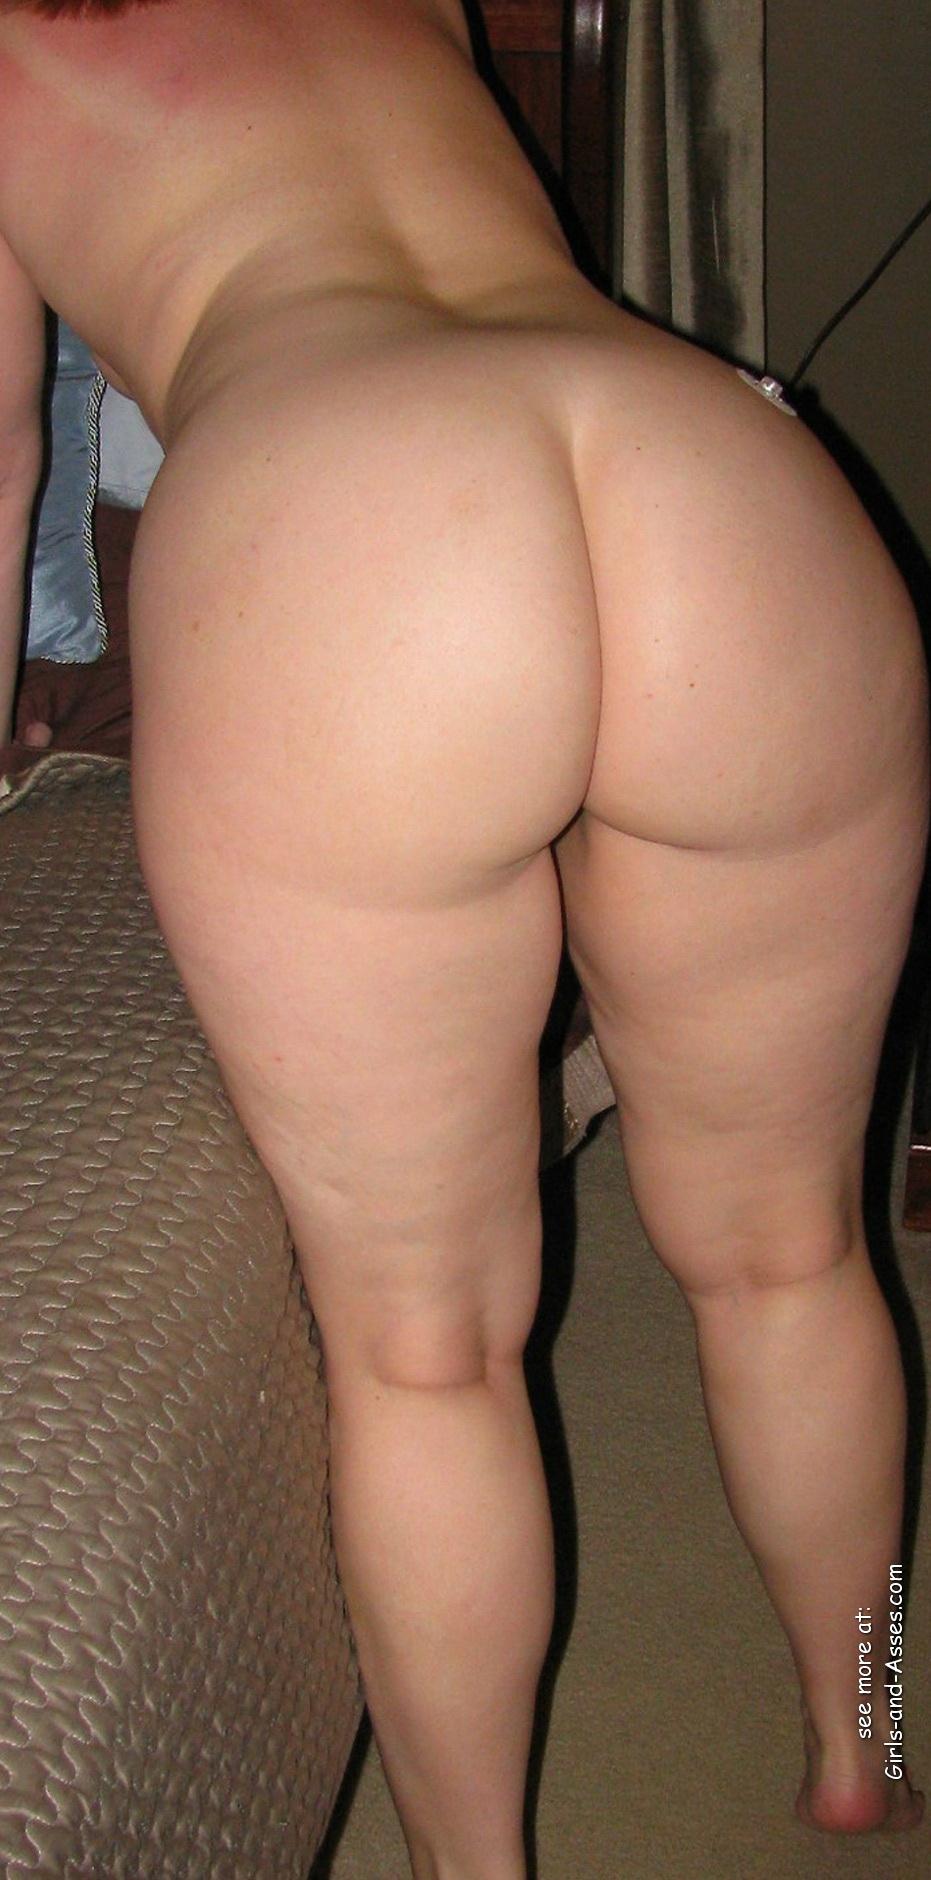 milf pawg booty photo 00330